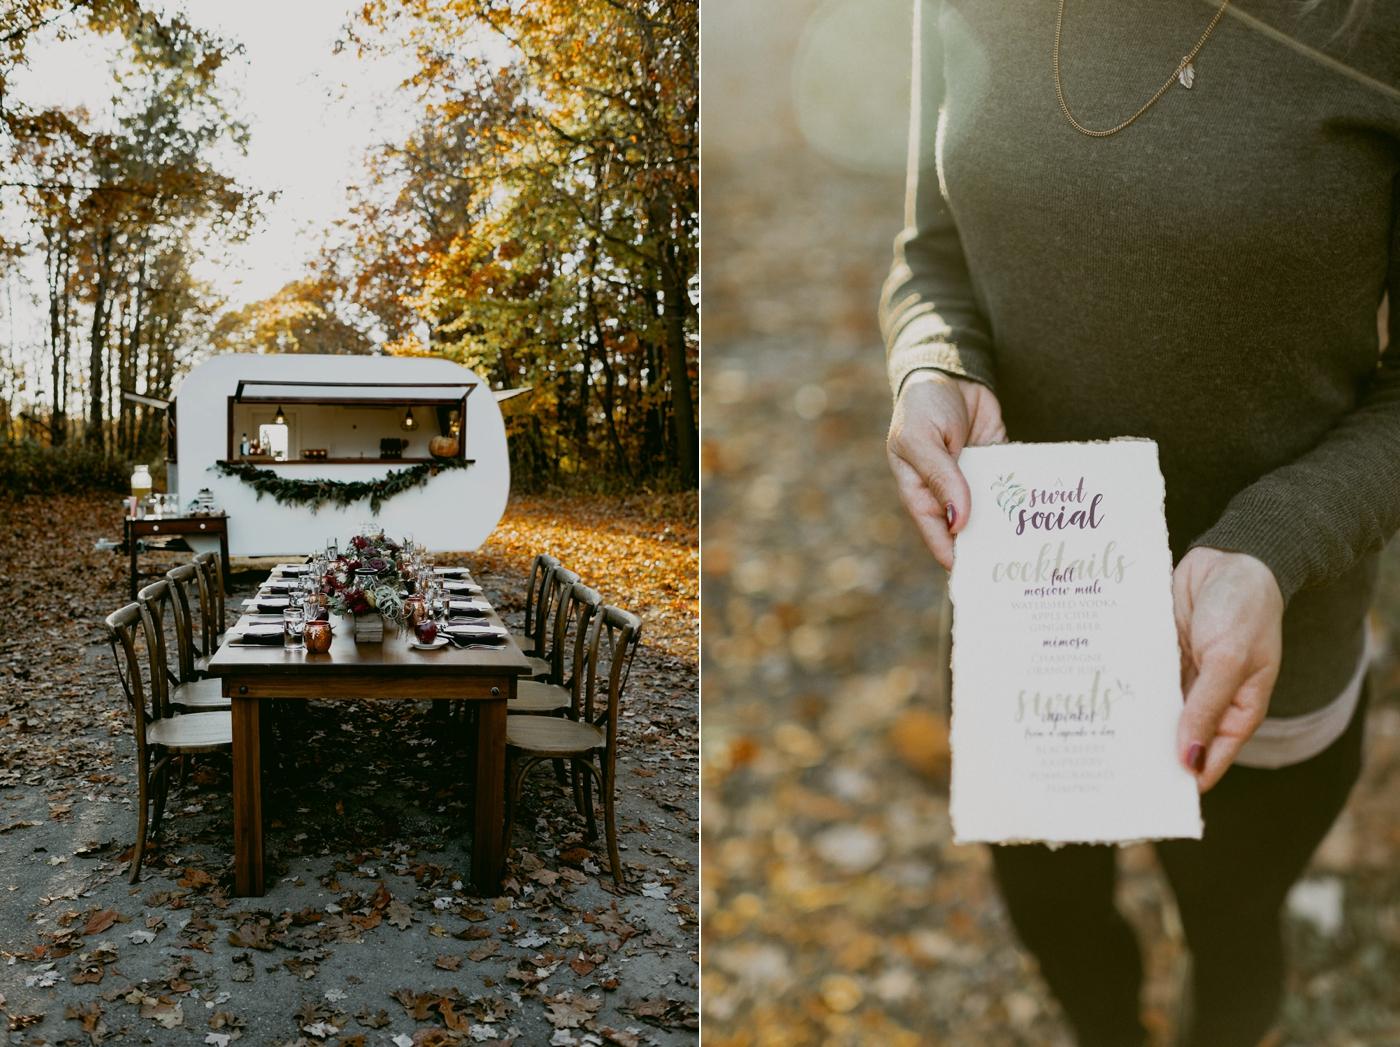 Autumn-Bridal-Shower-Vintage-Caravan-Styled-Shoot_MJPHOTO-28.jpg